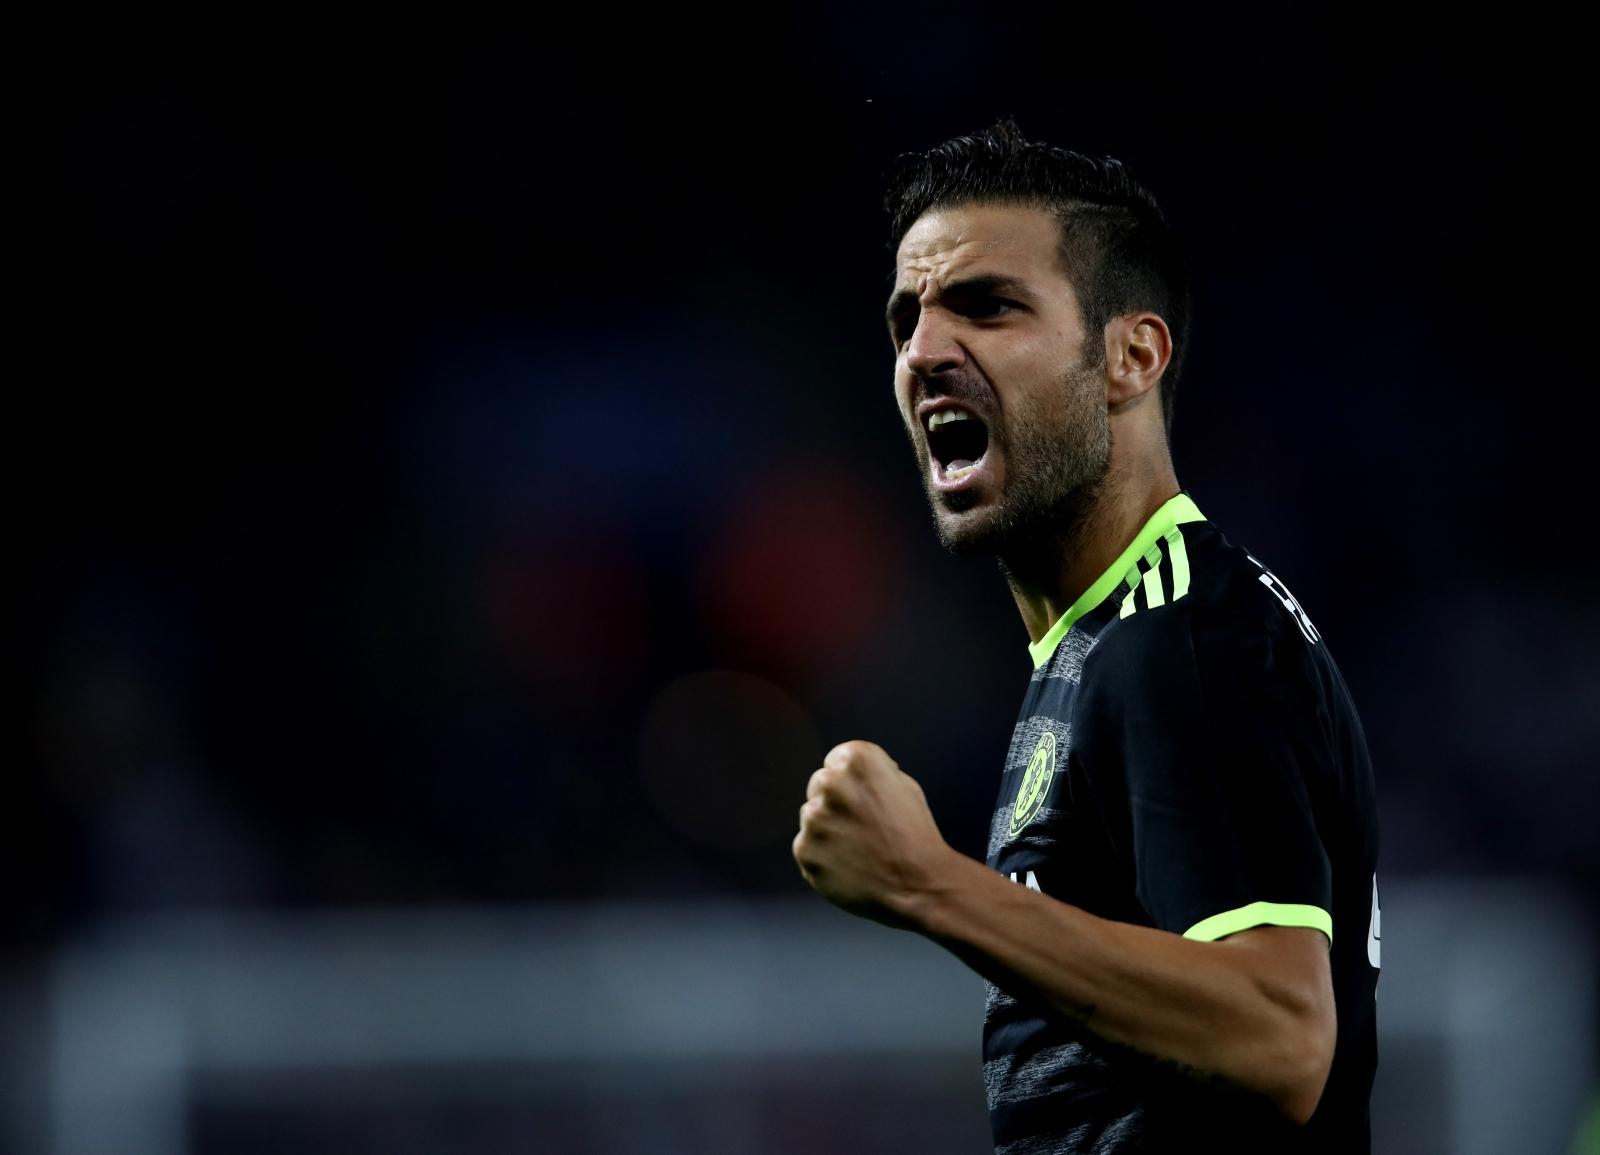 Cesc Fabregas Jorge Sampaoli not thinking about Chelsea